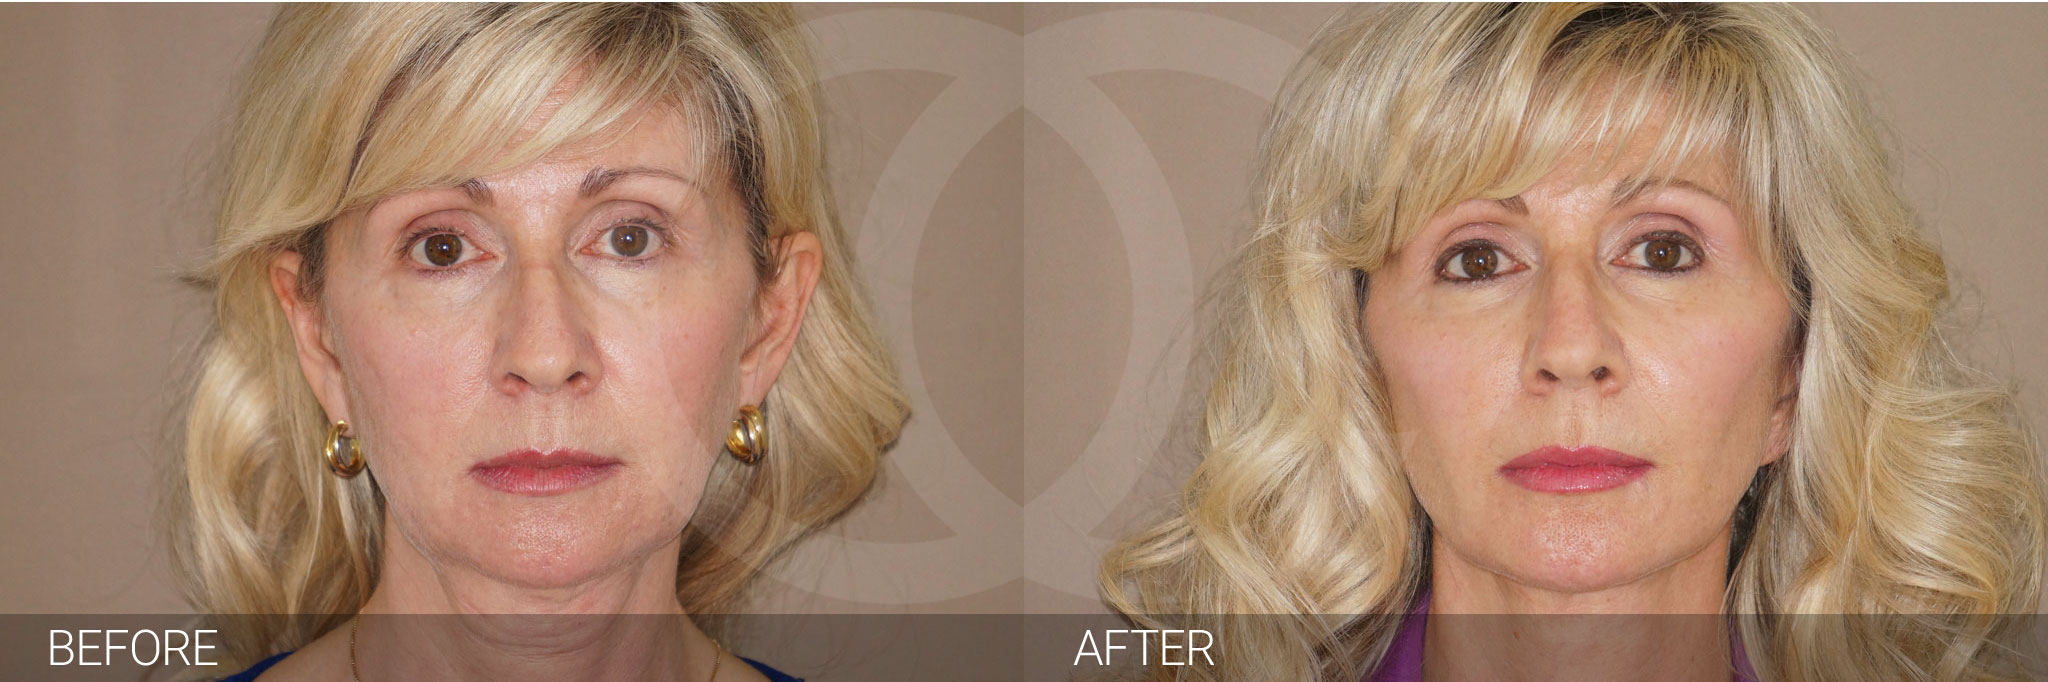 Fat grafting Facial fat transfer ante/post-op I